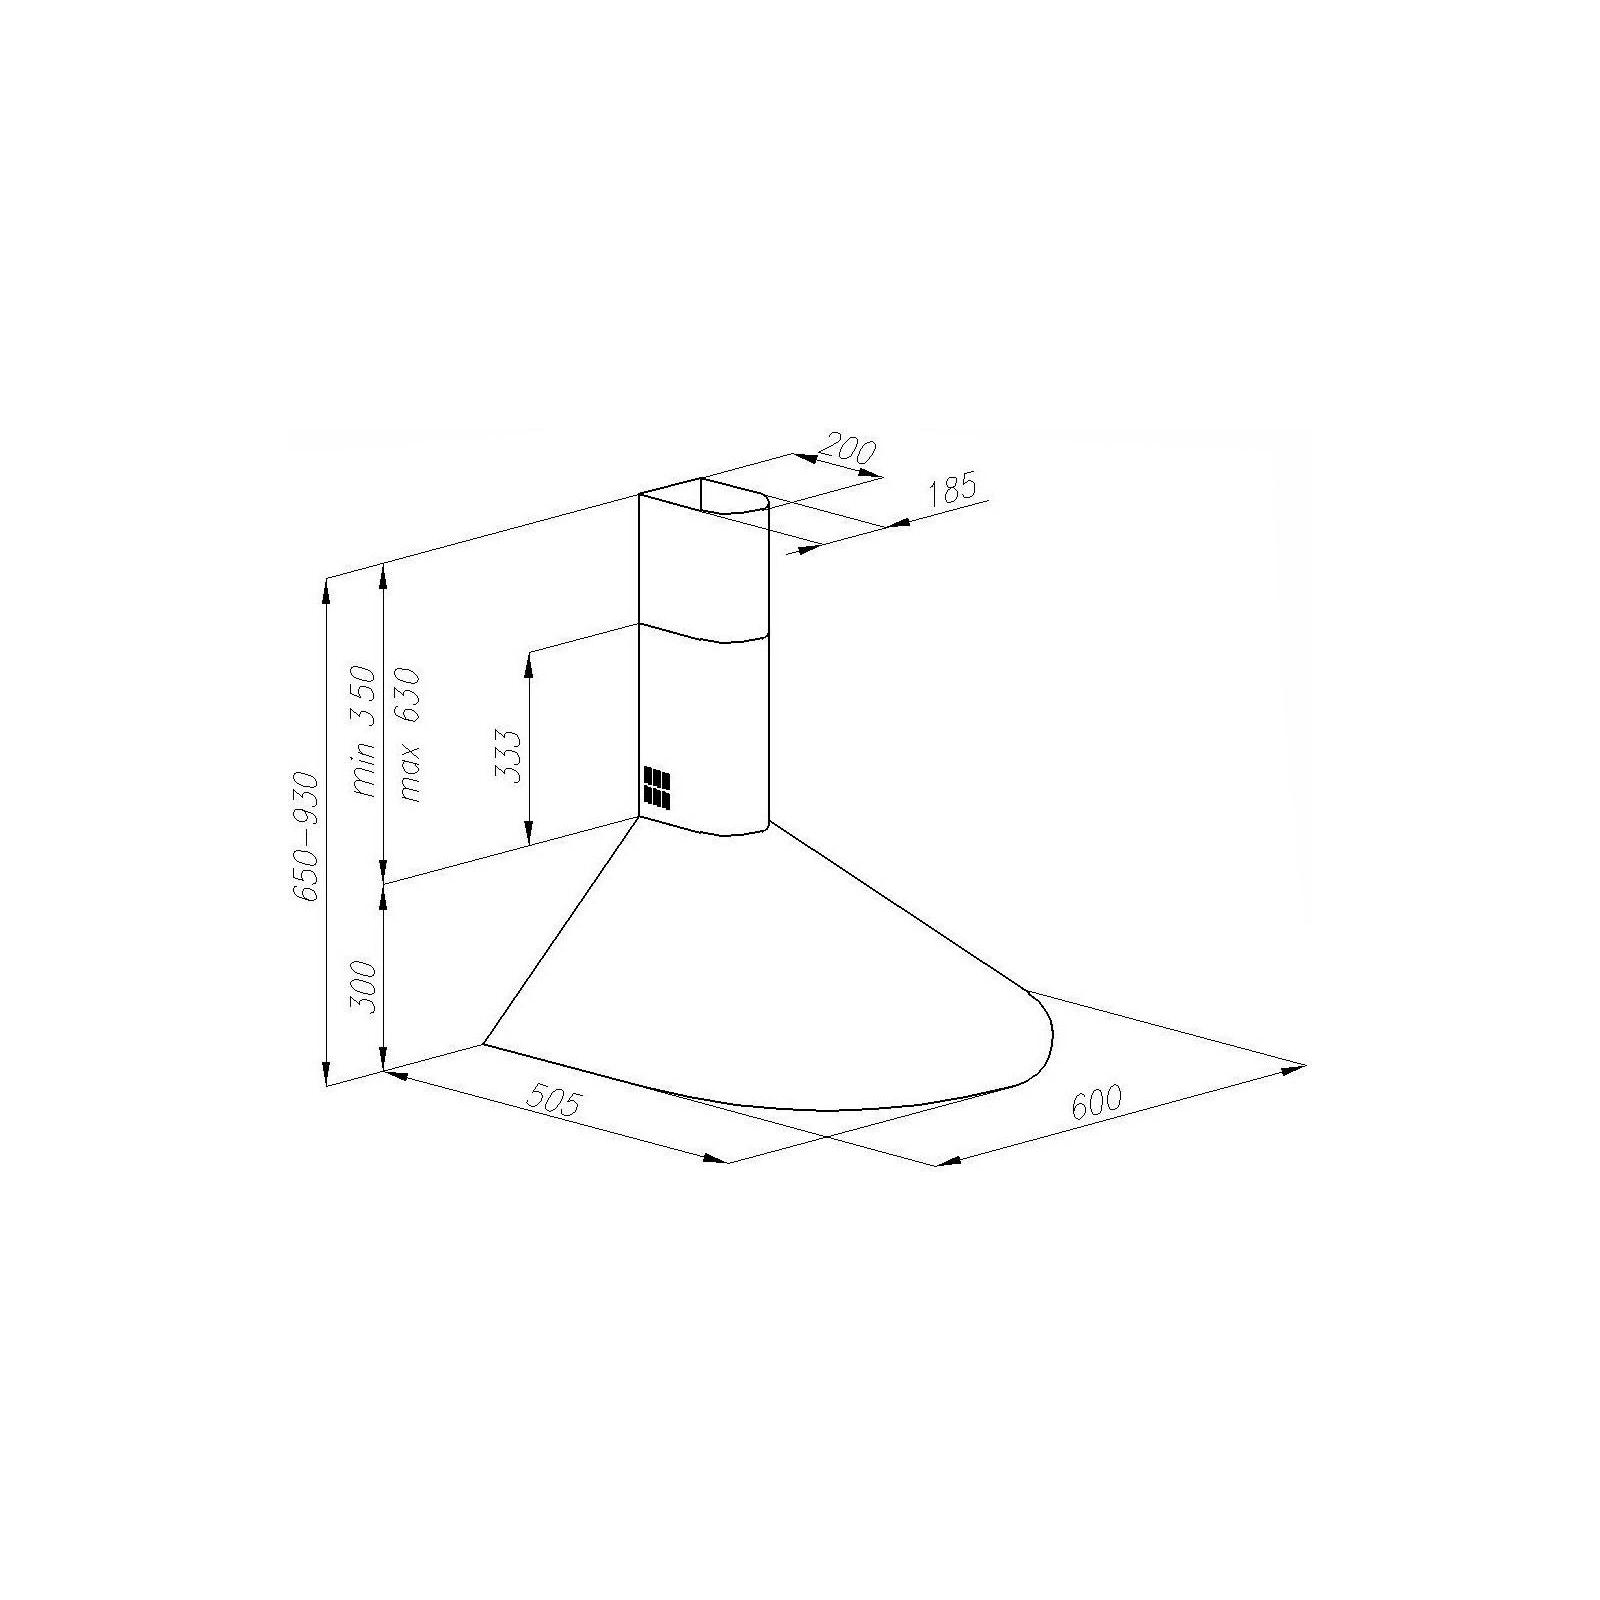 Вытяжка кухонная PERFELLI KR 610 W изображение 6